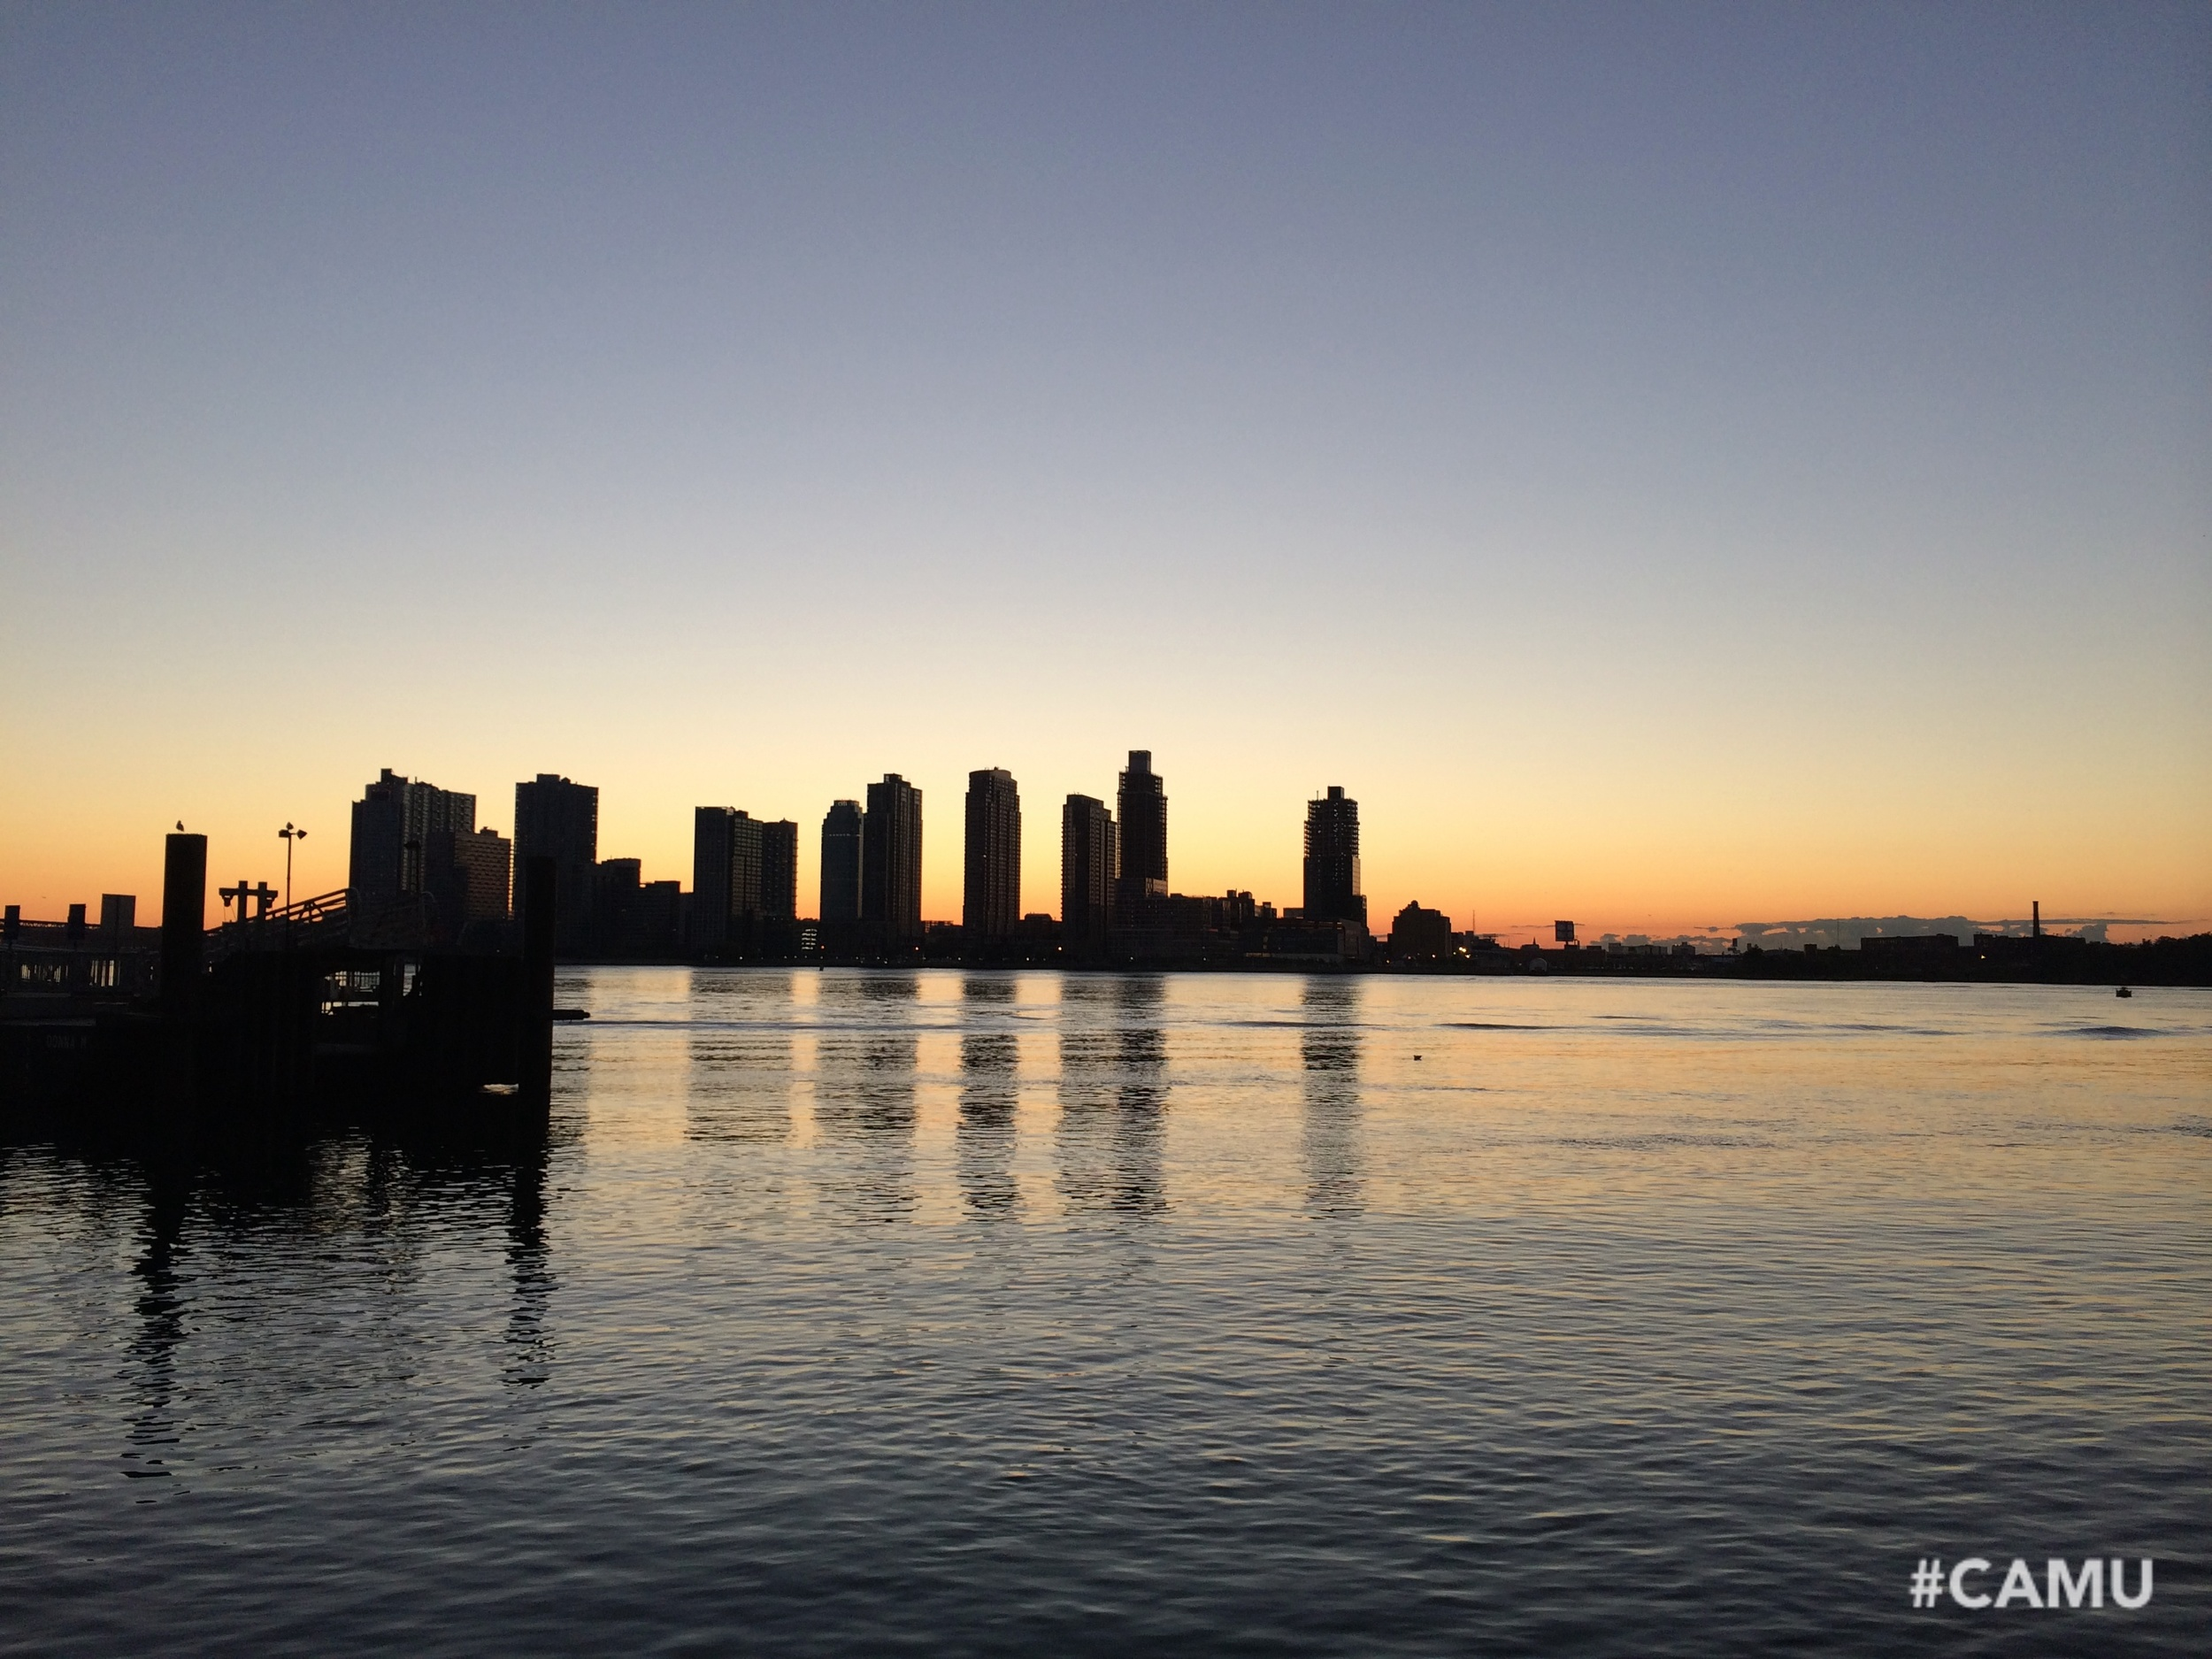 Ah NYC sunrise